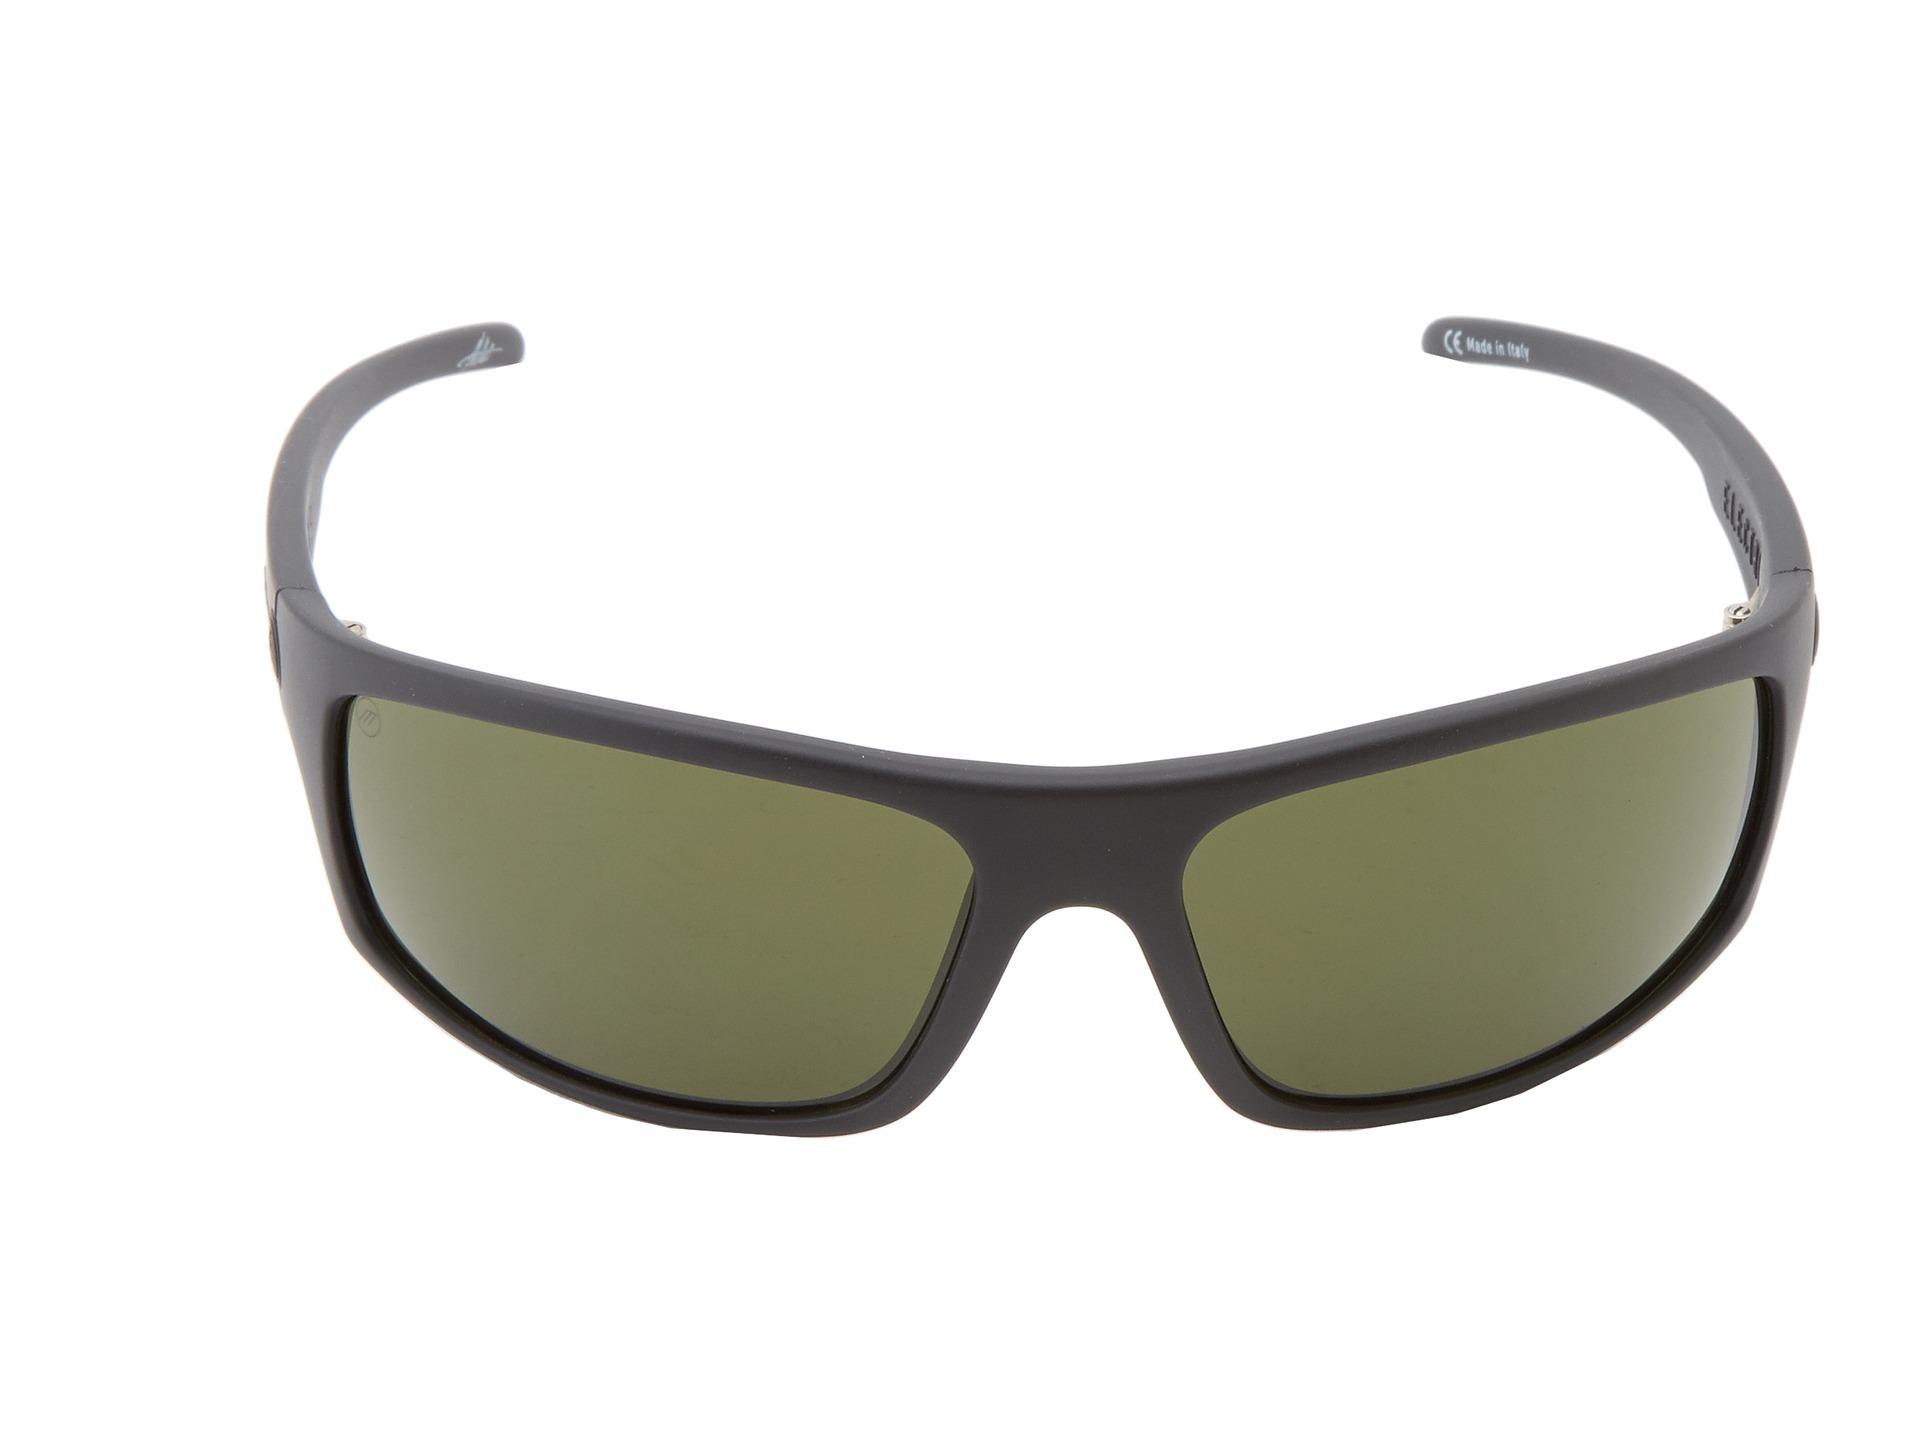 c357ec0bc8b Electric Hoodlum Sunglasses Polarized